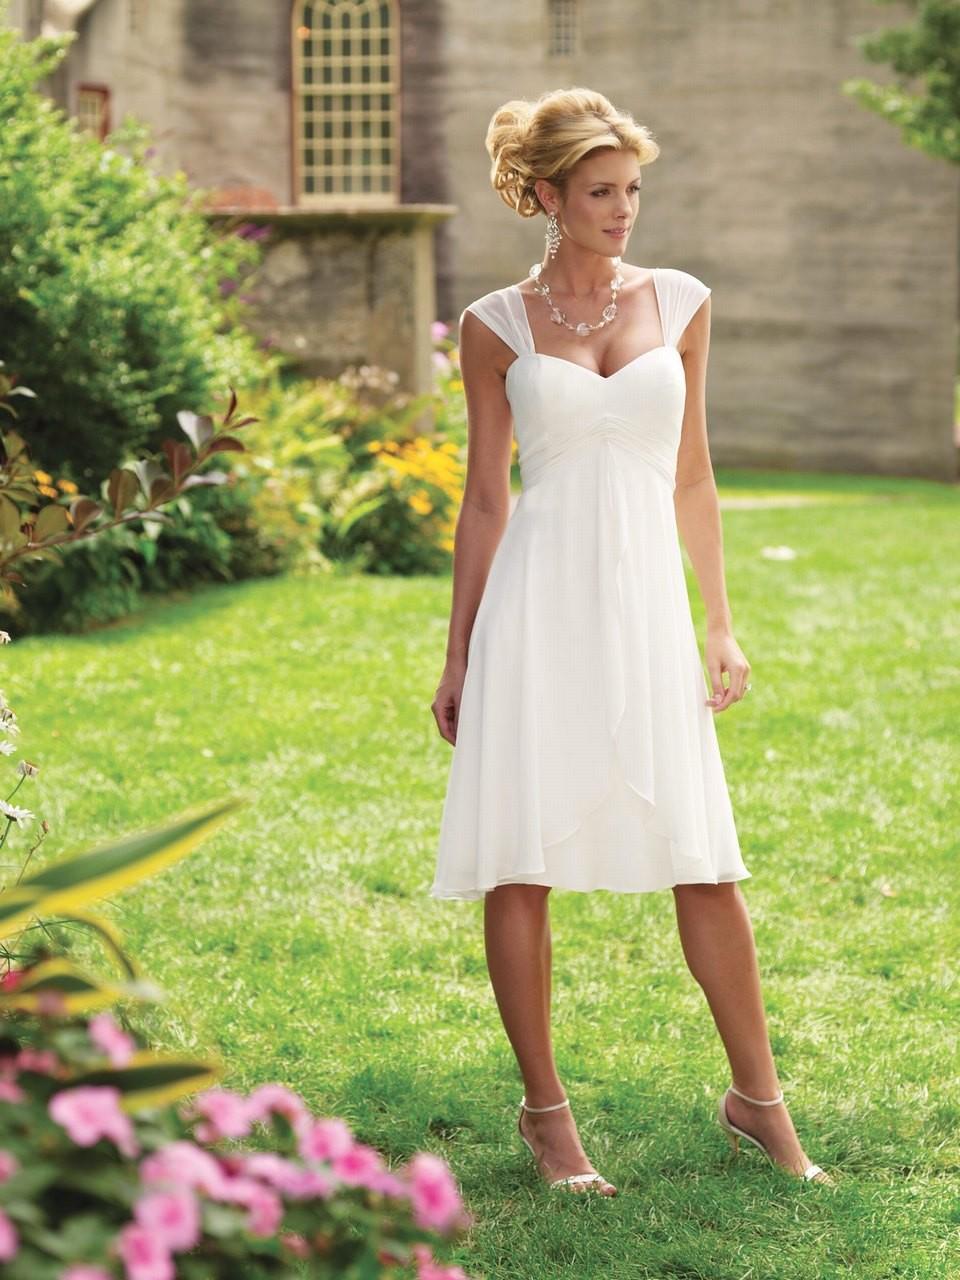 peach knee length bridesmaid dresses uk summer wedding dresses Navy Knee Length Bridesmaid Dresses Uk Wedding